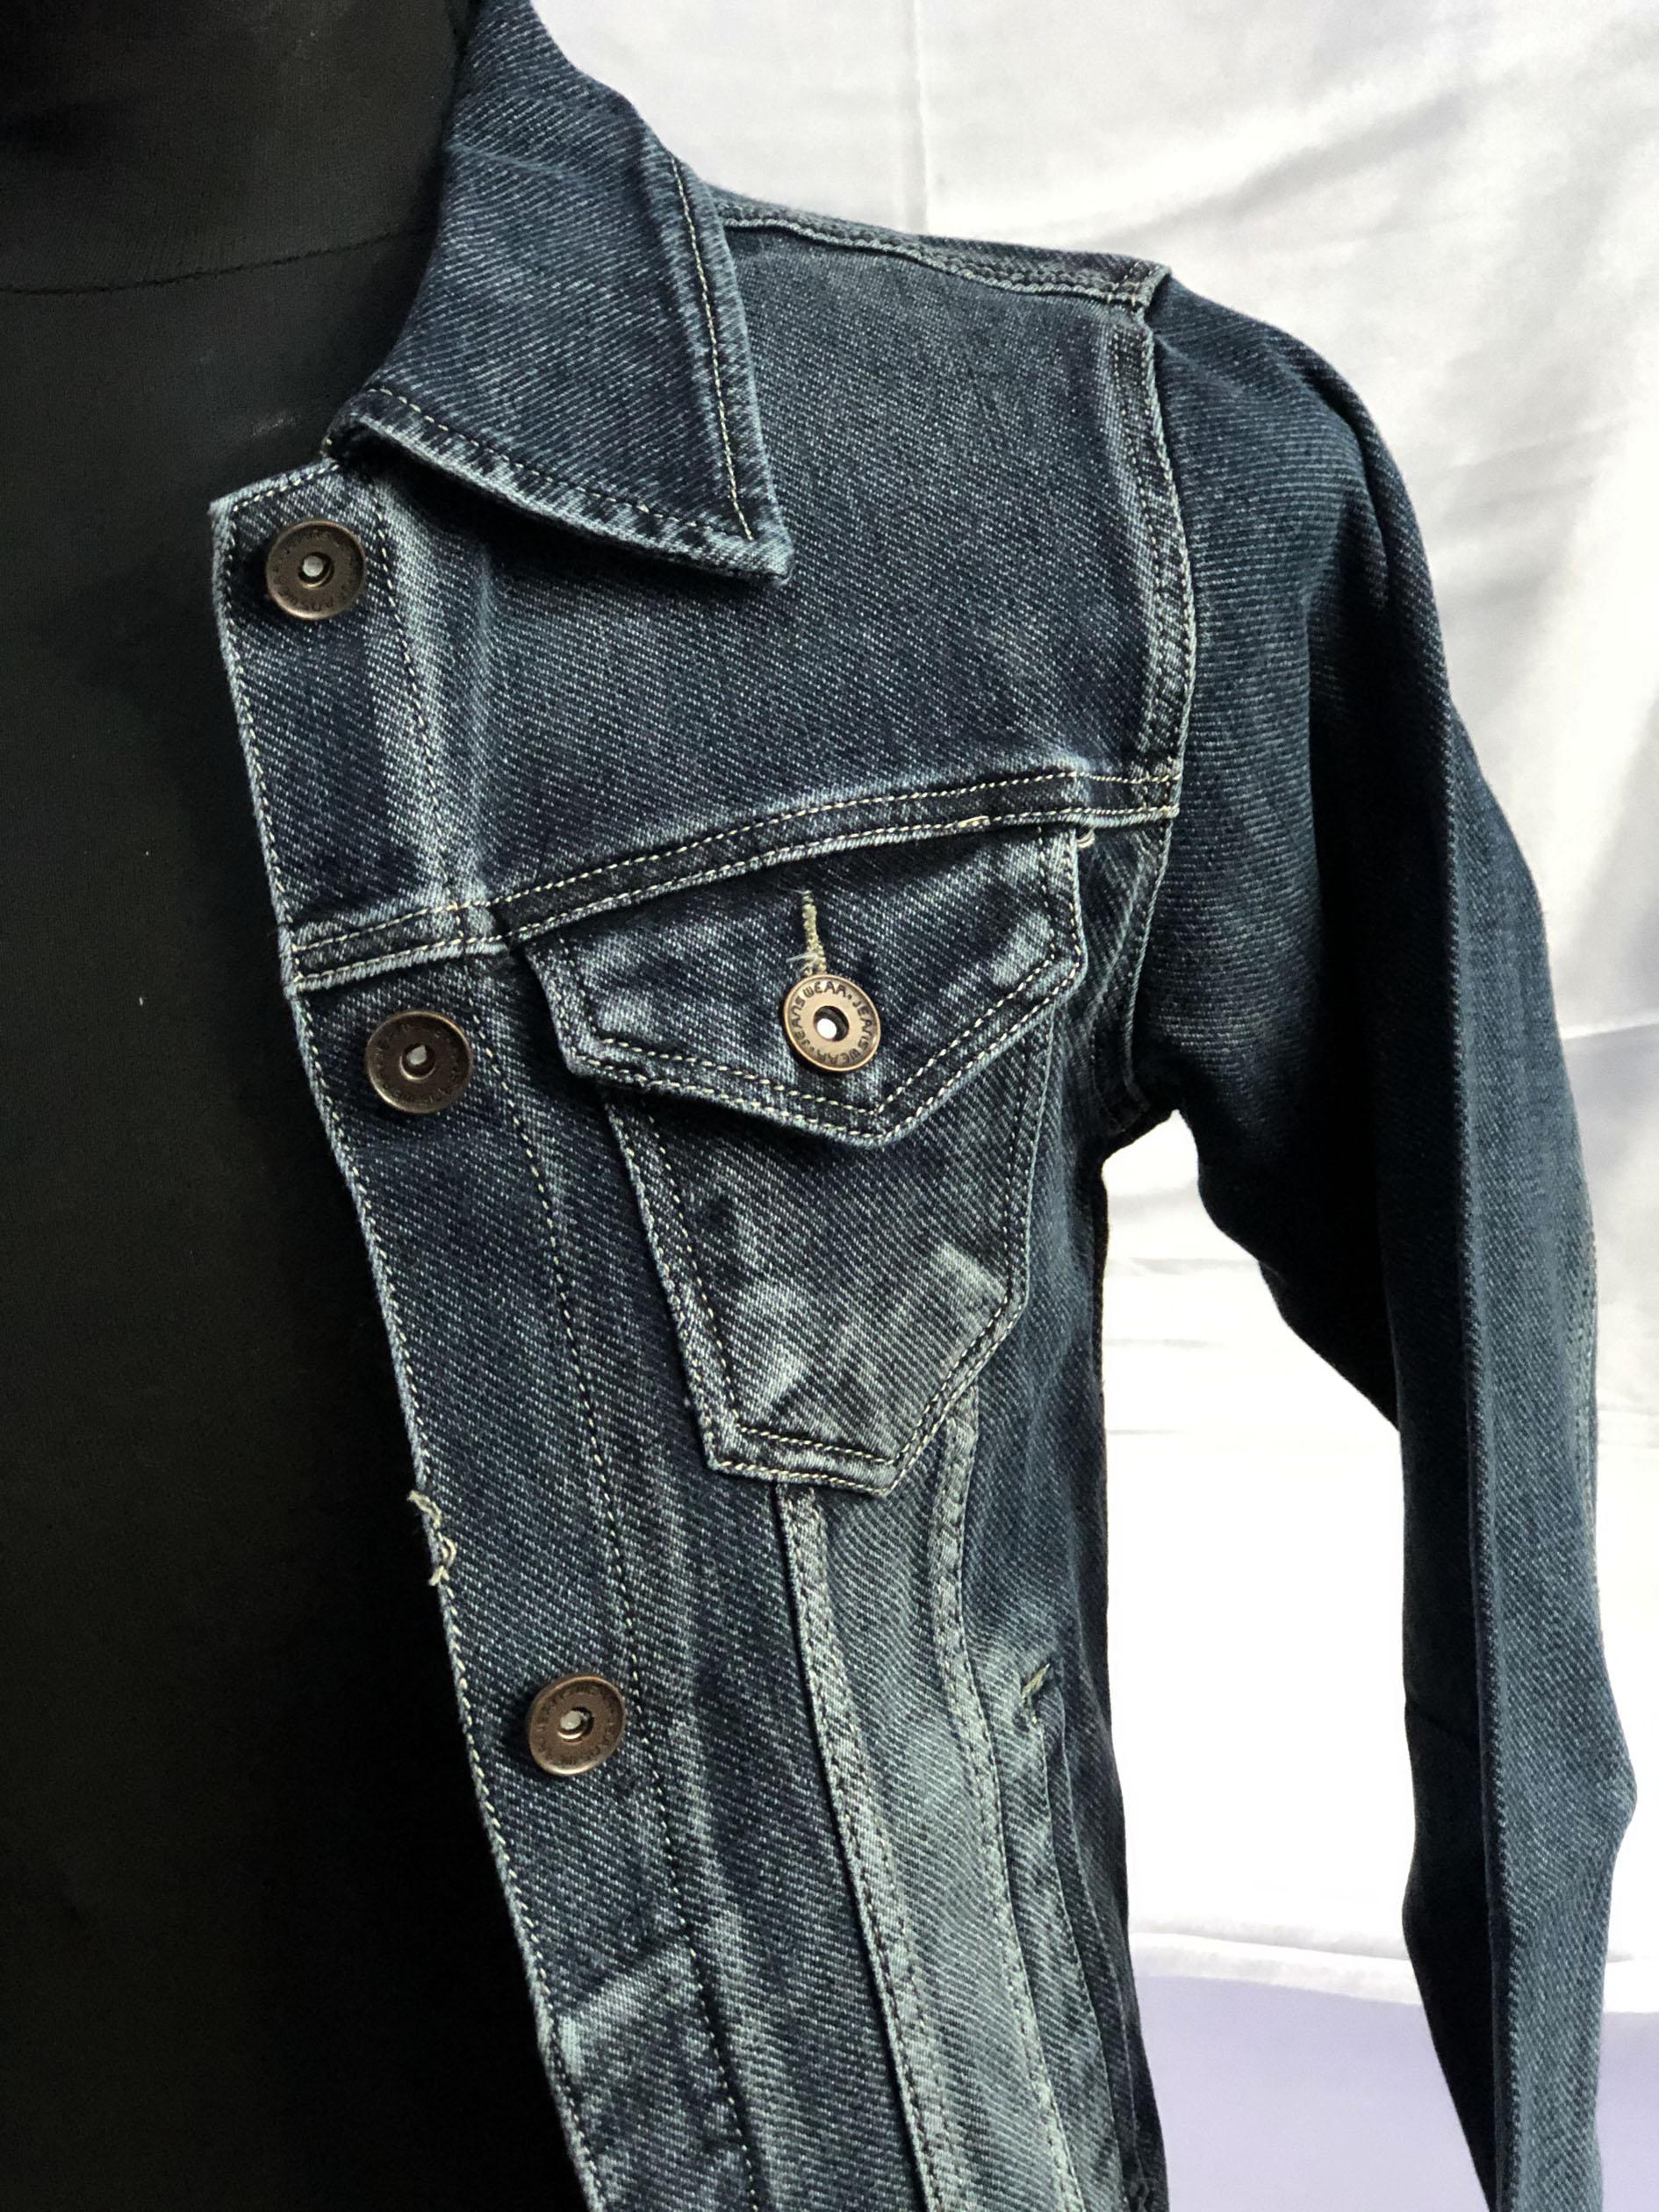 Wrangler Premium Jeans Jacket